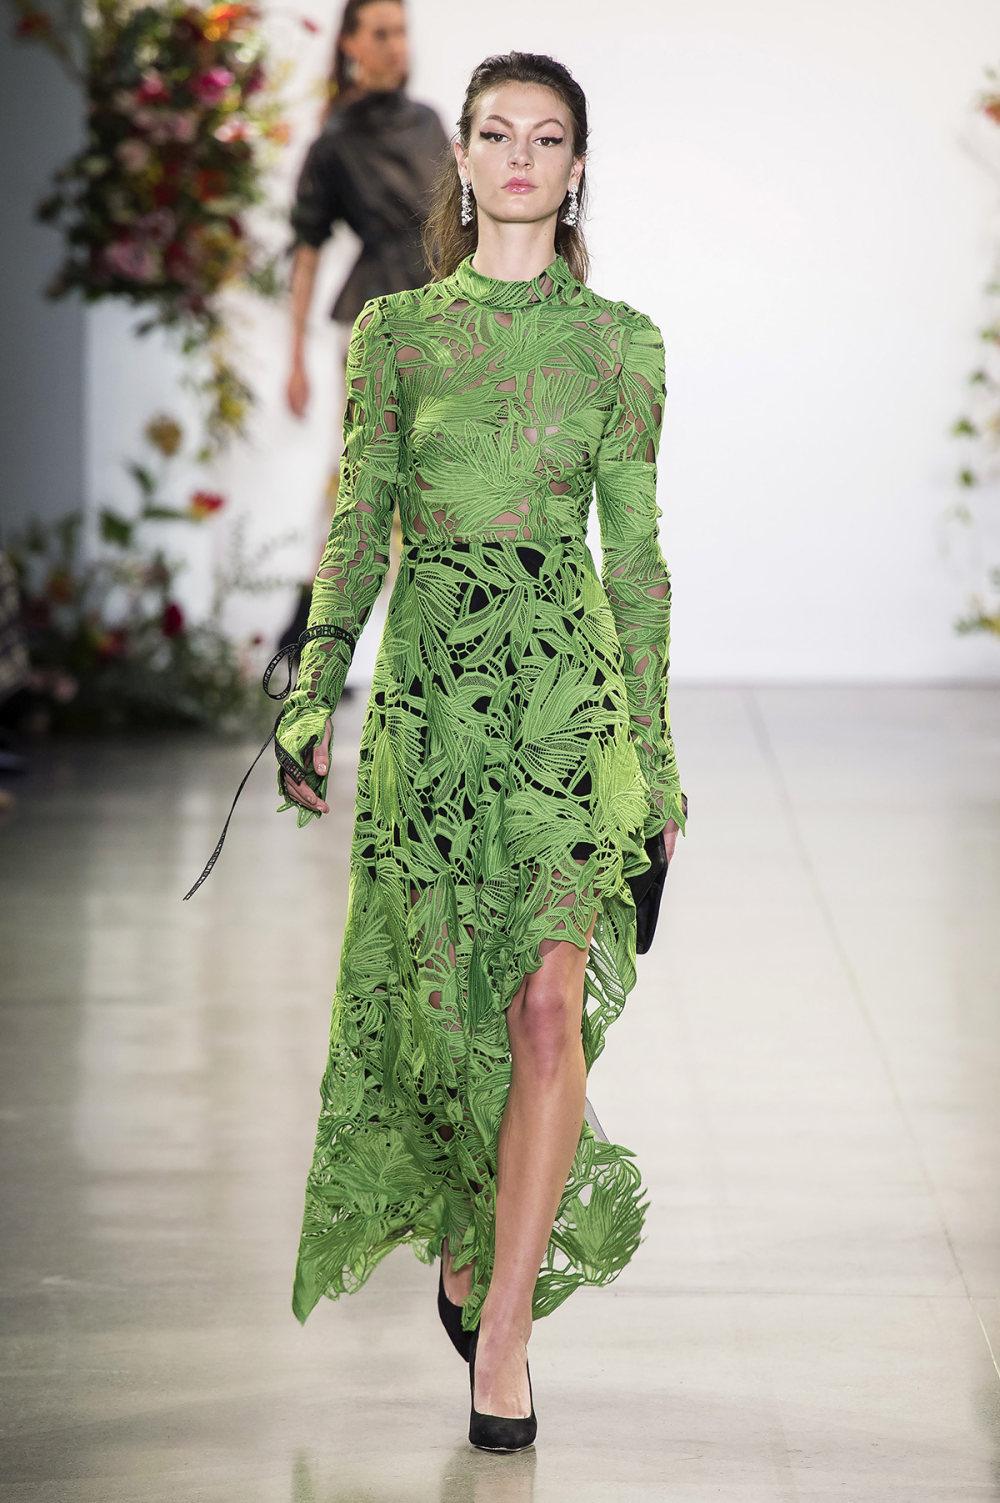 Bibhu Mohapatra时装系列颜色点缀蕾丝刺绣和结构的压轴礼服-10.jpg